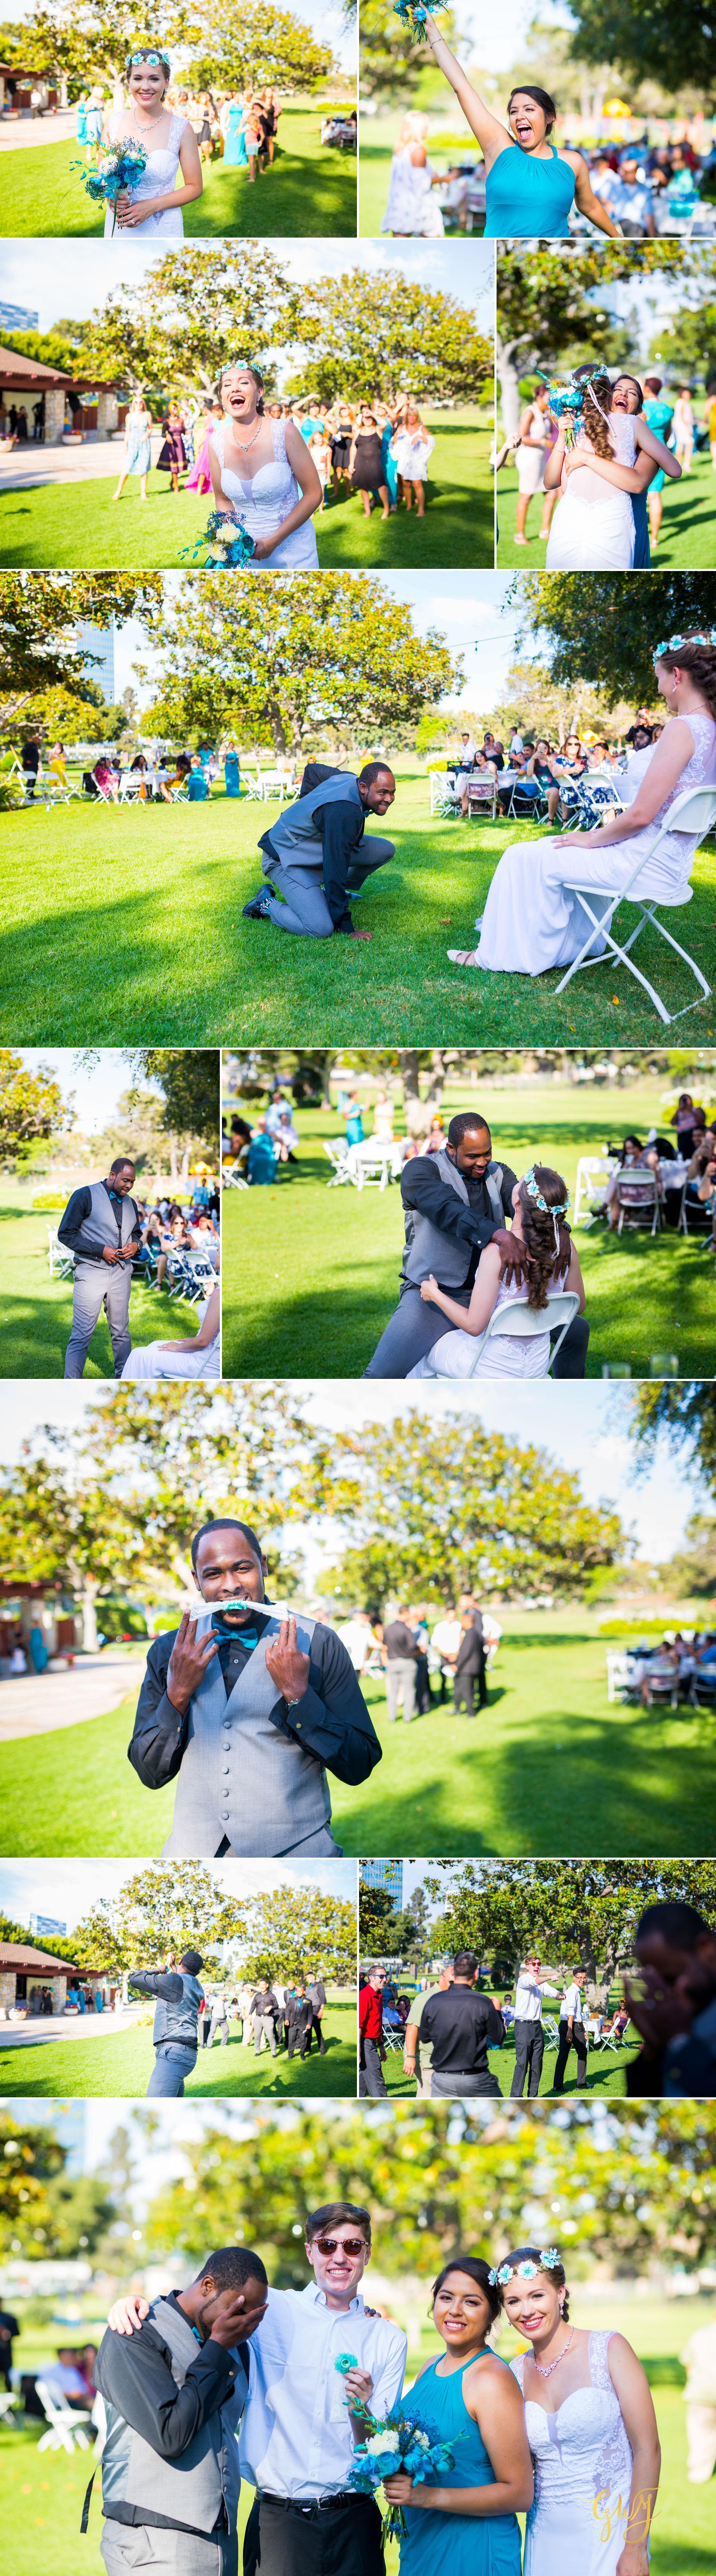 Rebecca + Torand El Segundo Chevron Employee Park Summer Barbados Bajan Wedding by Glass Woods Media 12.jpg